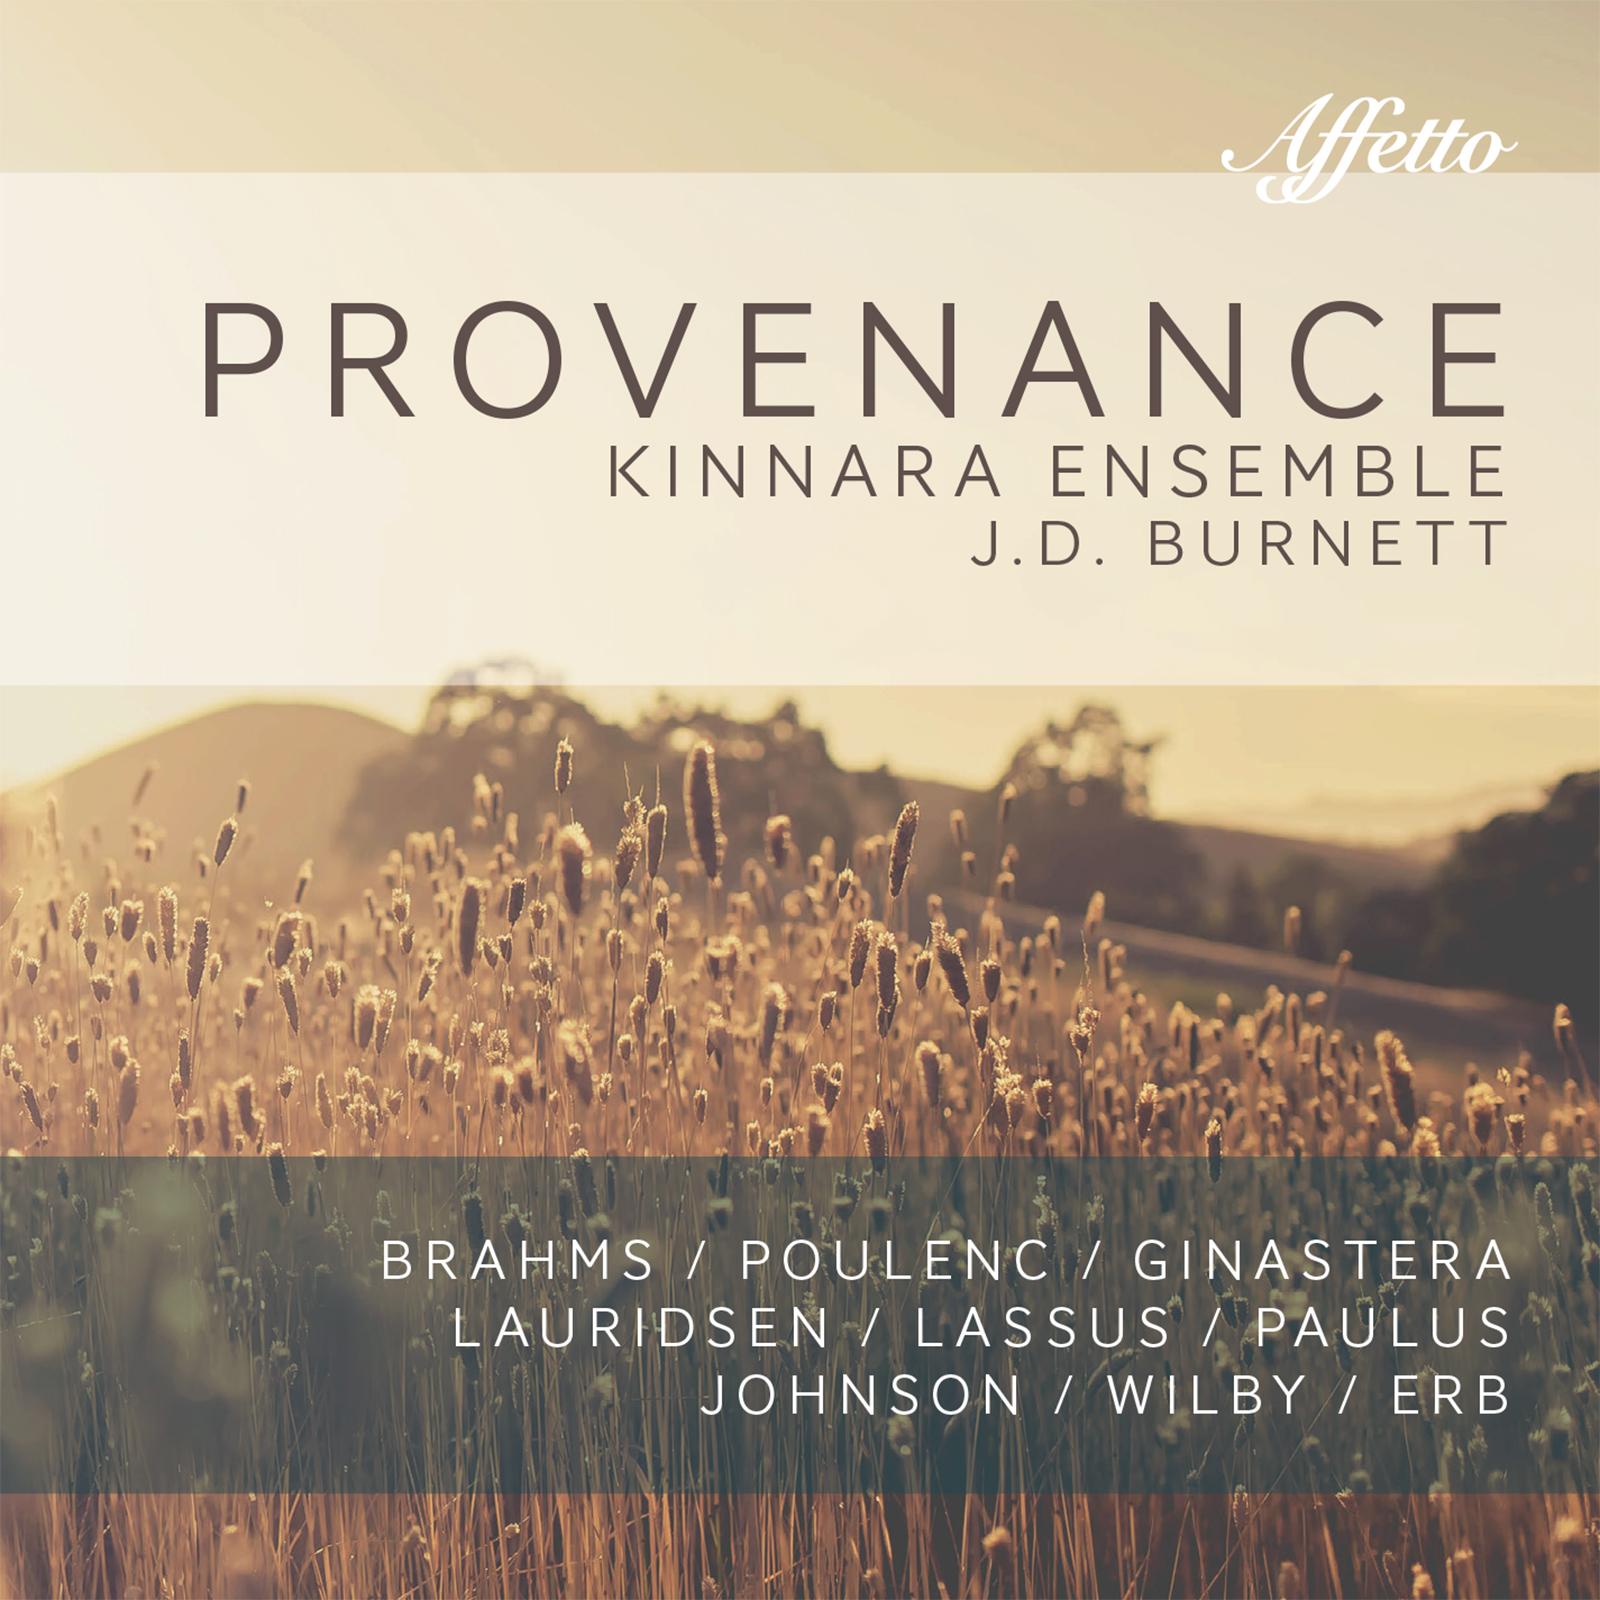 Provenance by the Kinnara Ensemble / J.D. Burnett